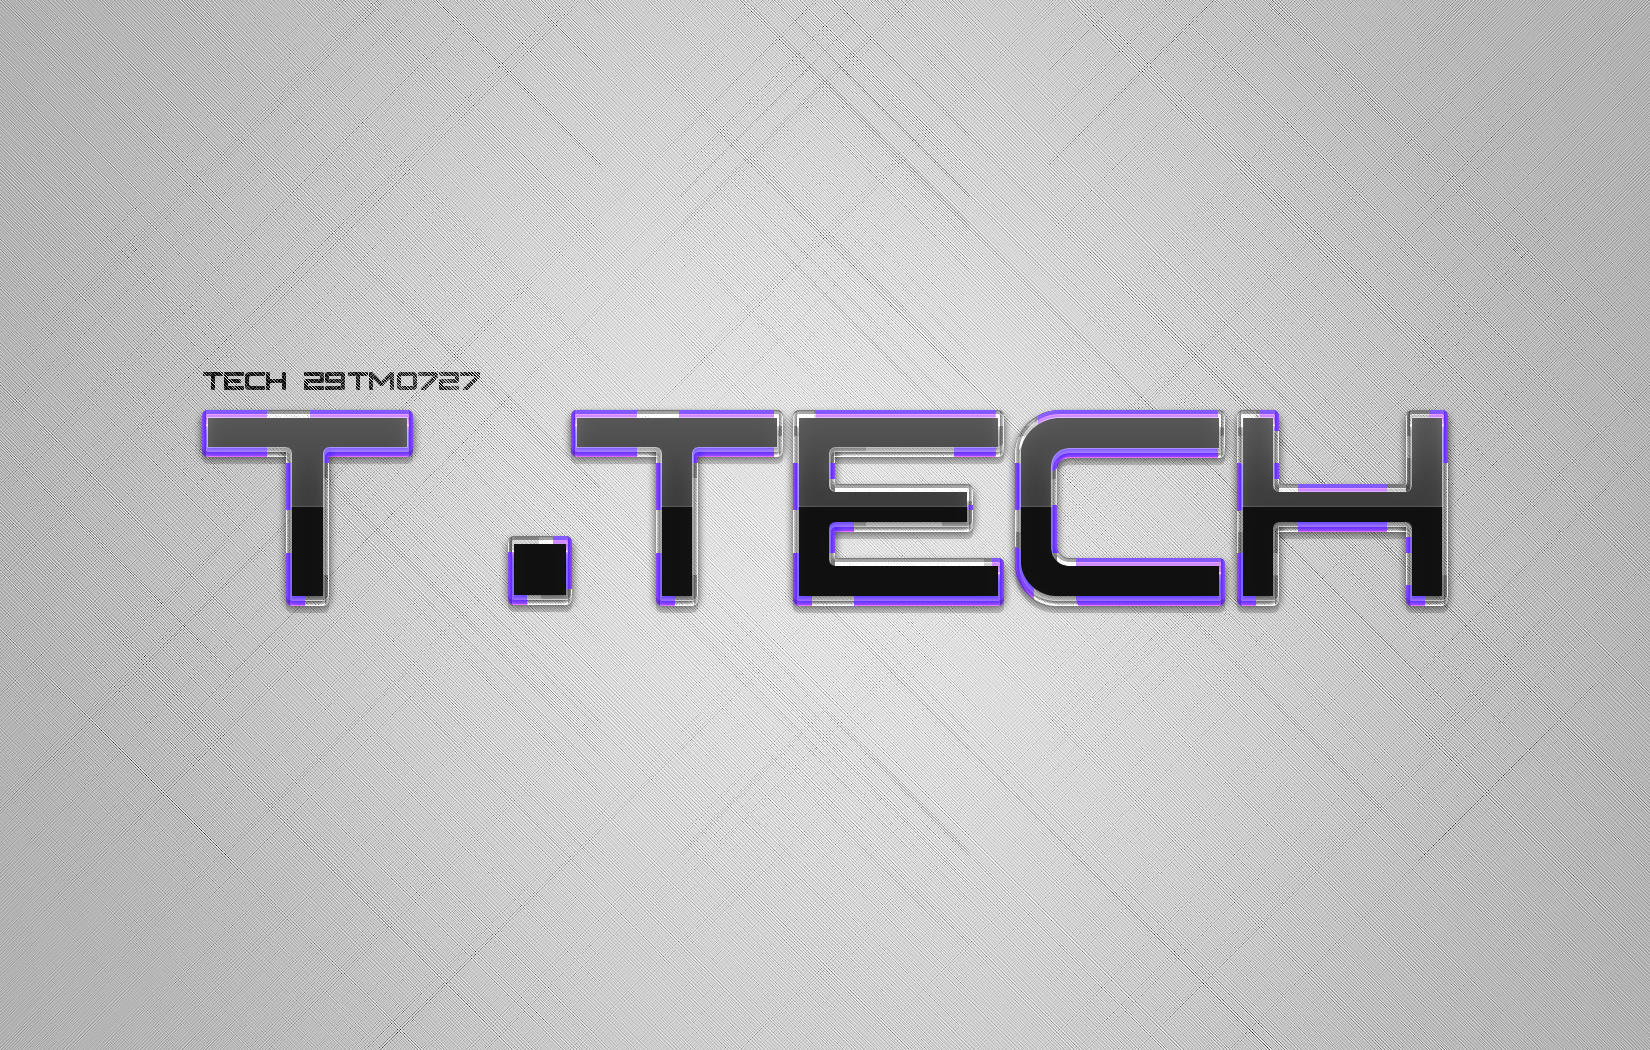 TECH 29TM0727 by 007TINAR